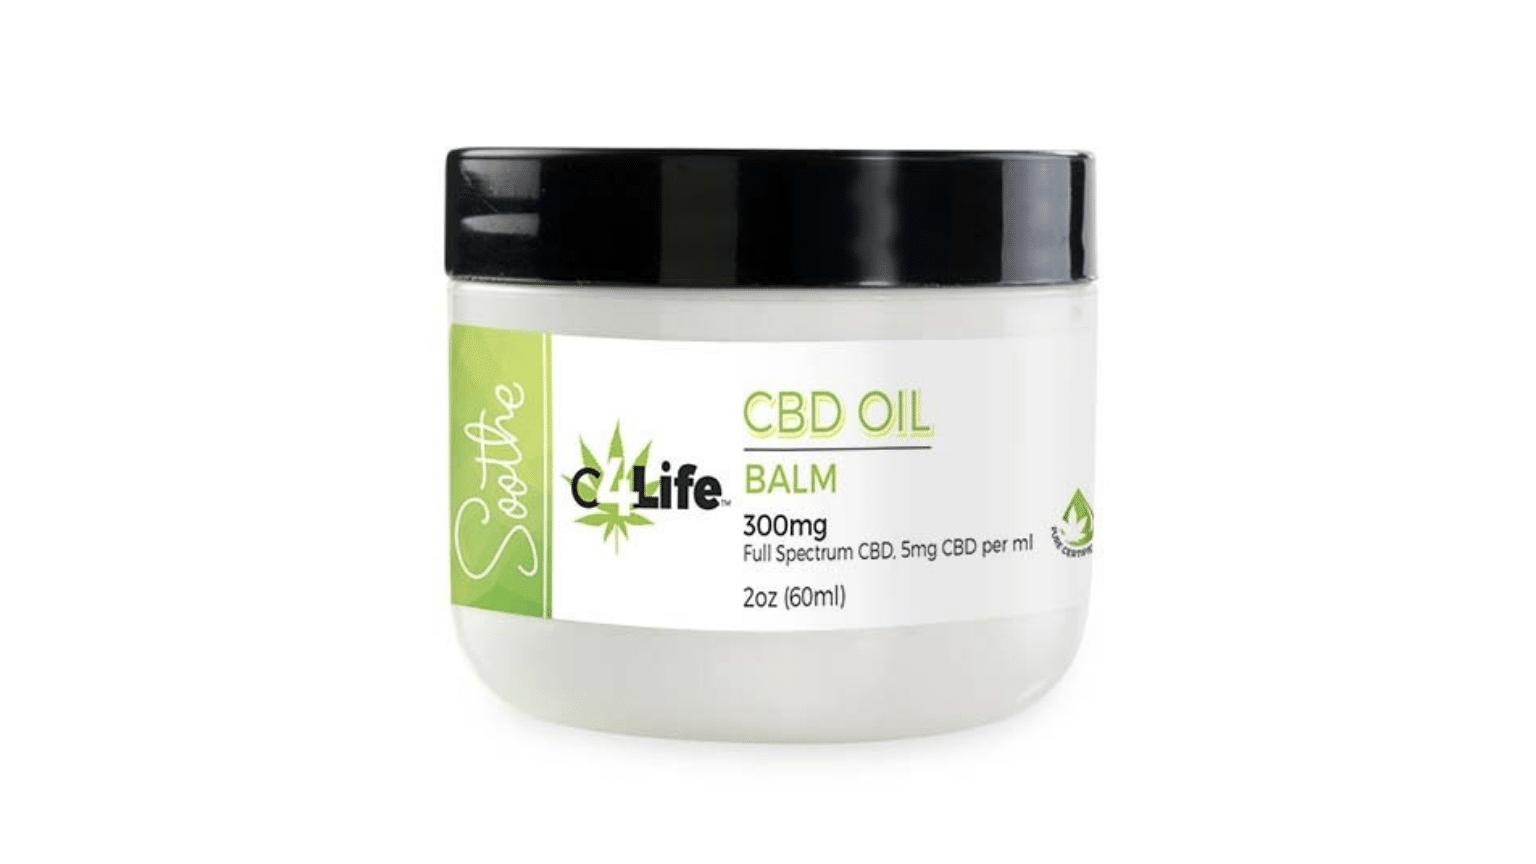 c4life-cbd-oil-balm